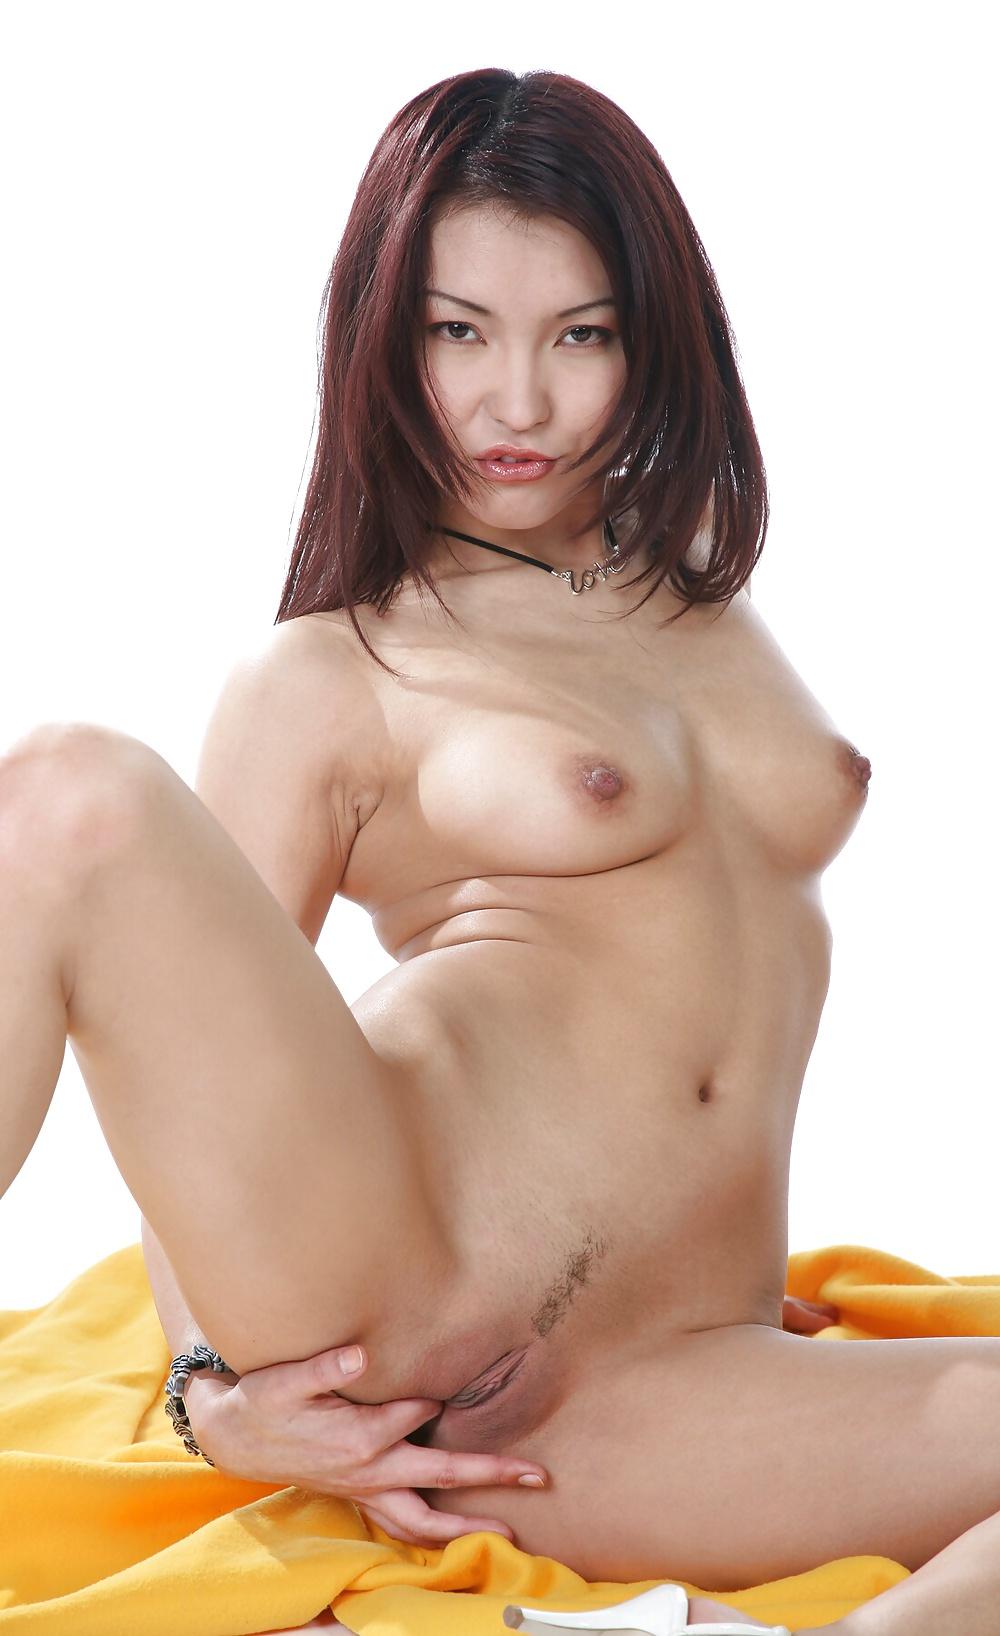 Valerie bertinelli pussy porn — photo 4